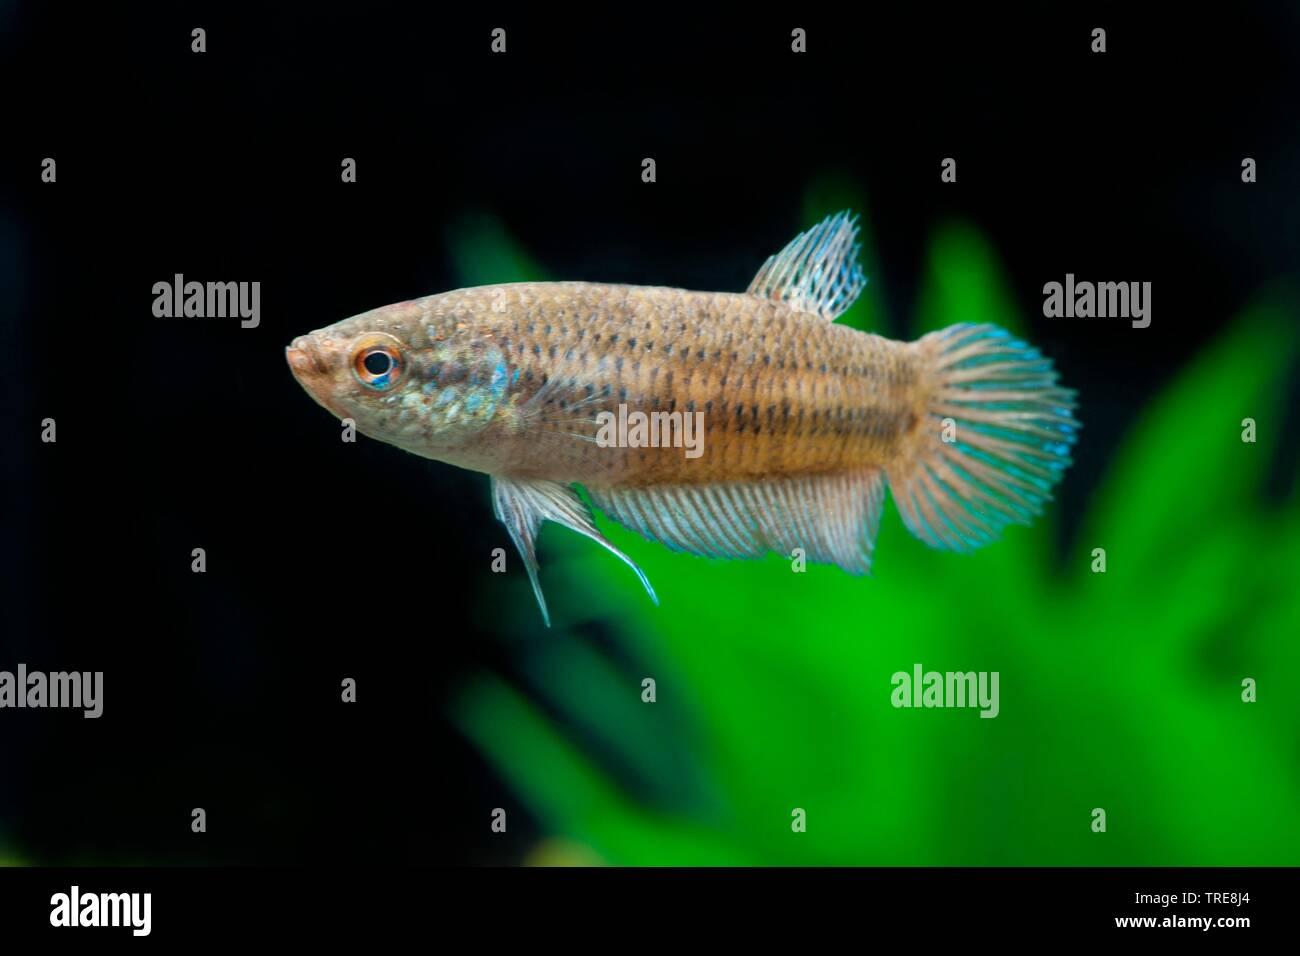 Smaragd-Kampffisch, Smaragdkampffisch (Betta smaragdina), im Aquarium | Peaceful Betta (Betta smaragdina), in aquarium | BLWS520048.jpg [ (c) blickwin - Stock Image